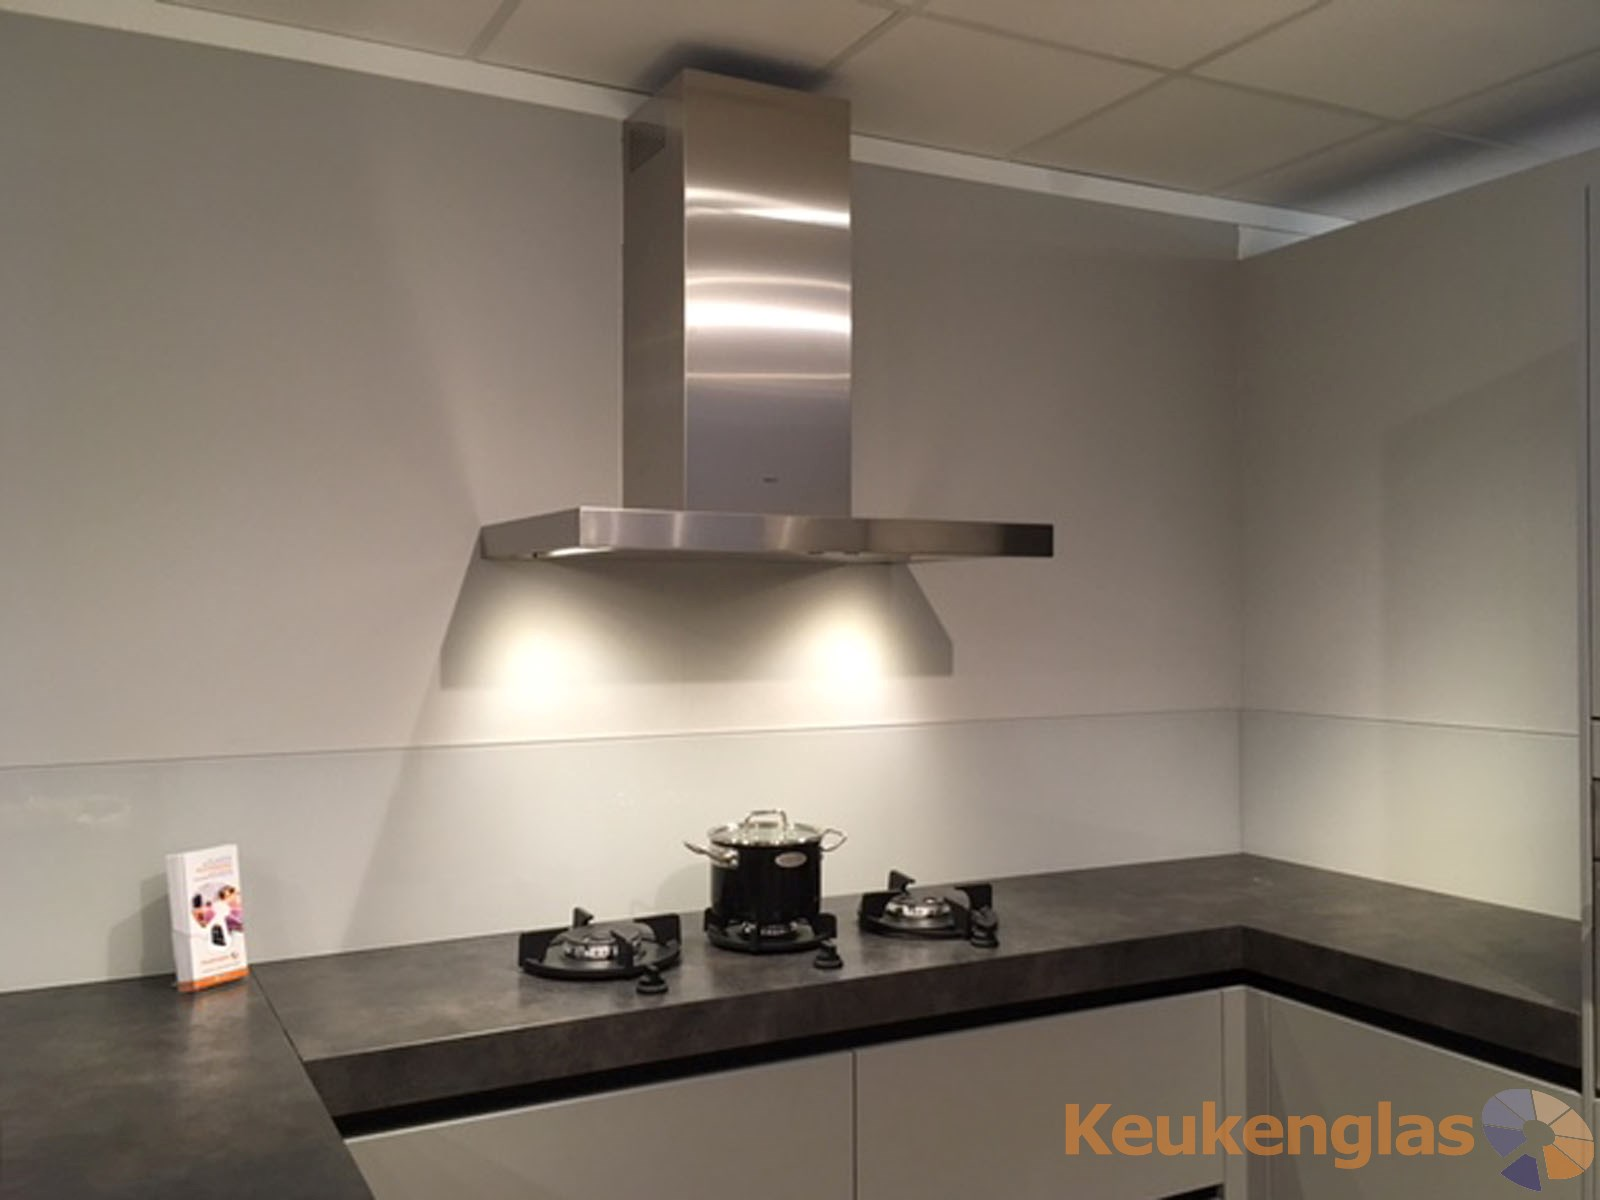 Badkamer Showroom Amersfoort : Glazen achterwand showroom eigen huis keukens amersfoort keukenglas